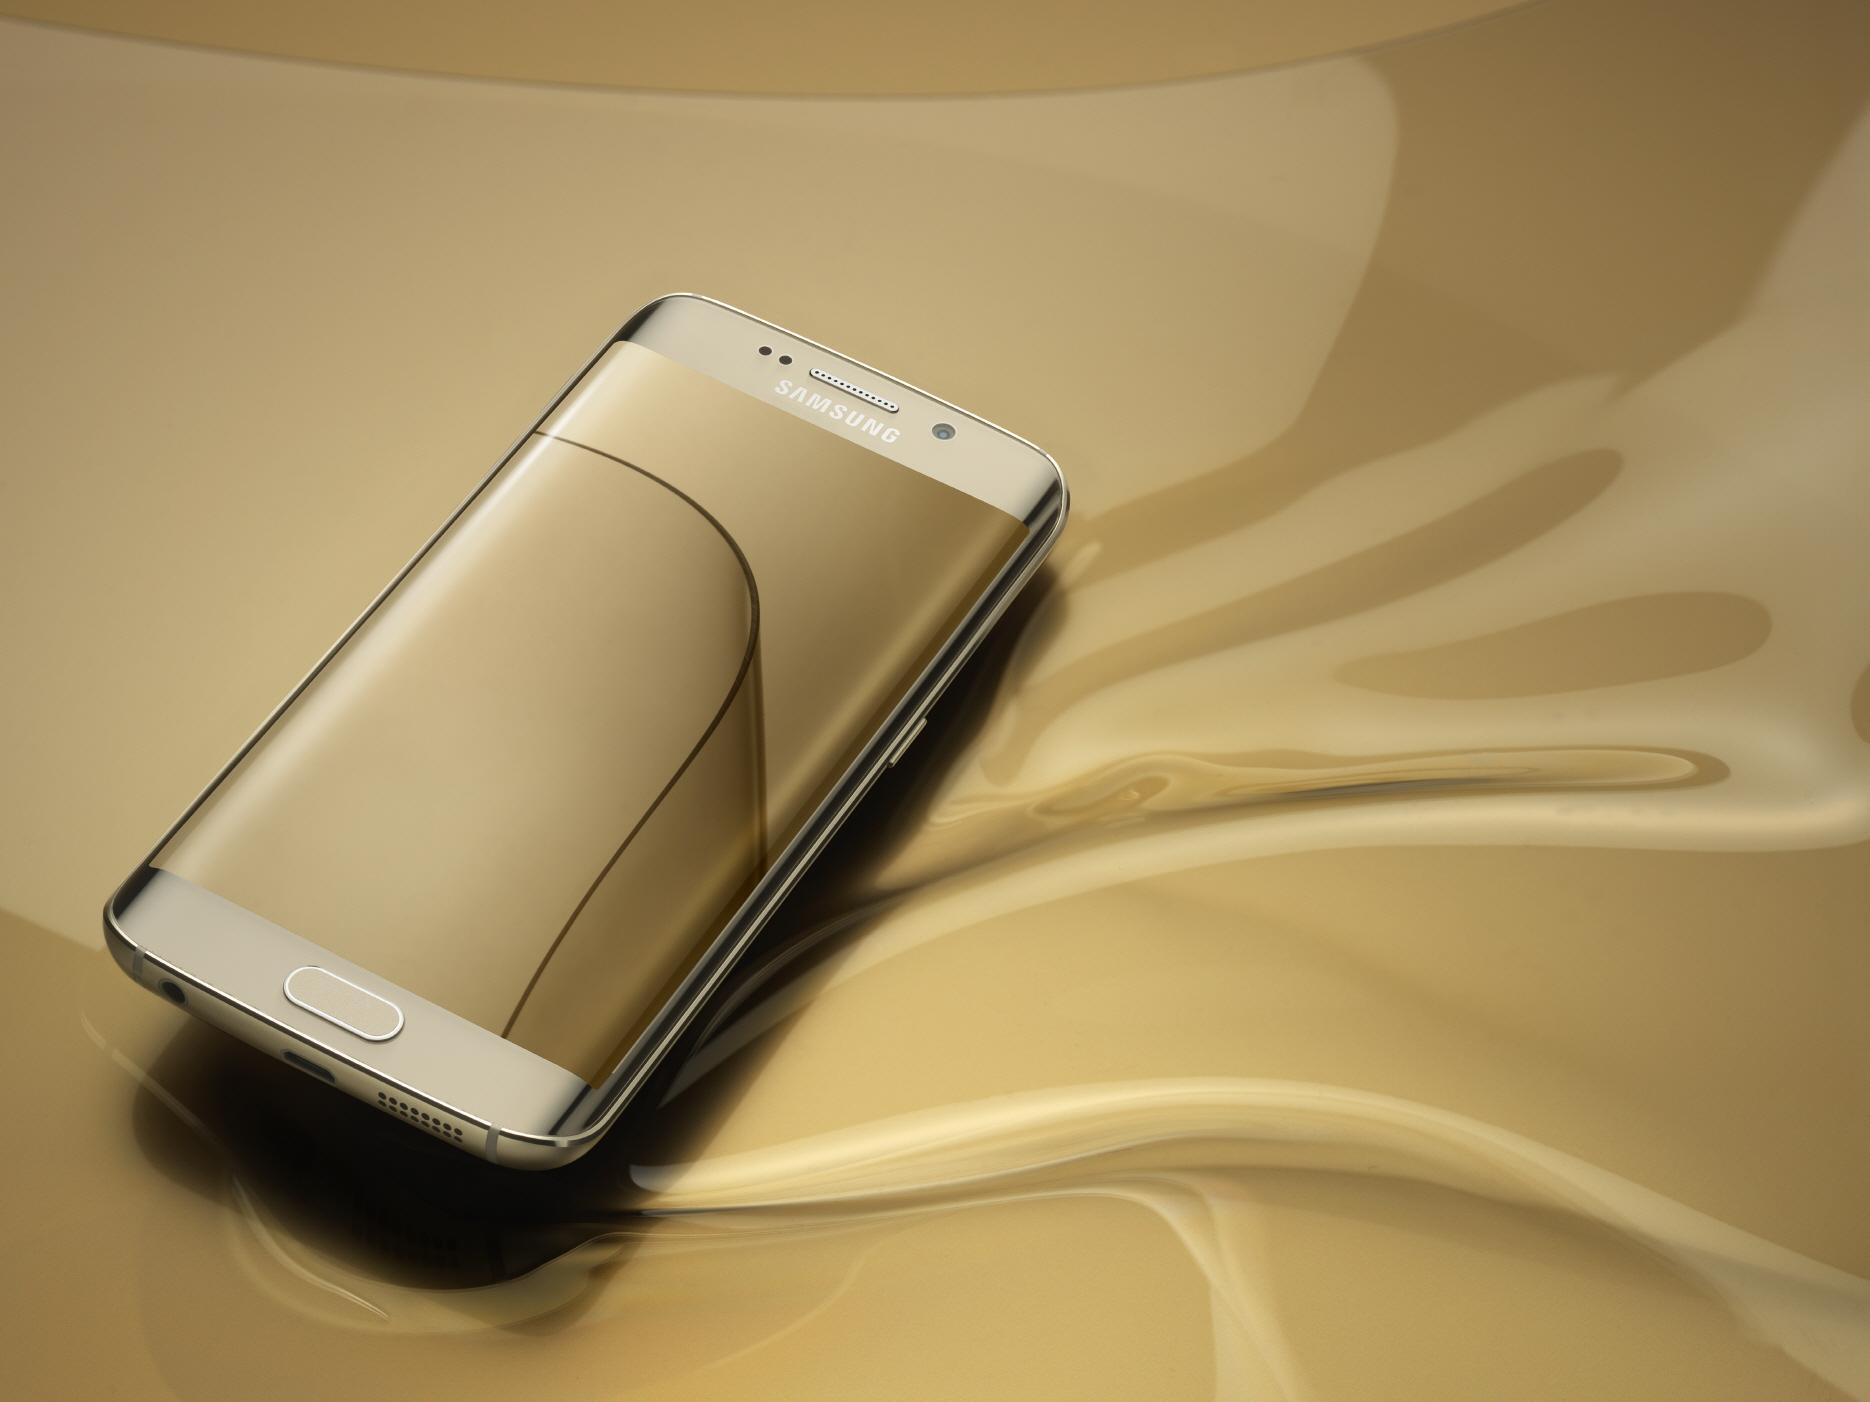 Samsung Galaxy S6 Edge 1870x1402 Wallpaper Teahub Io